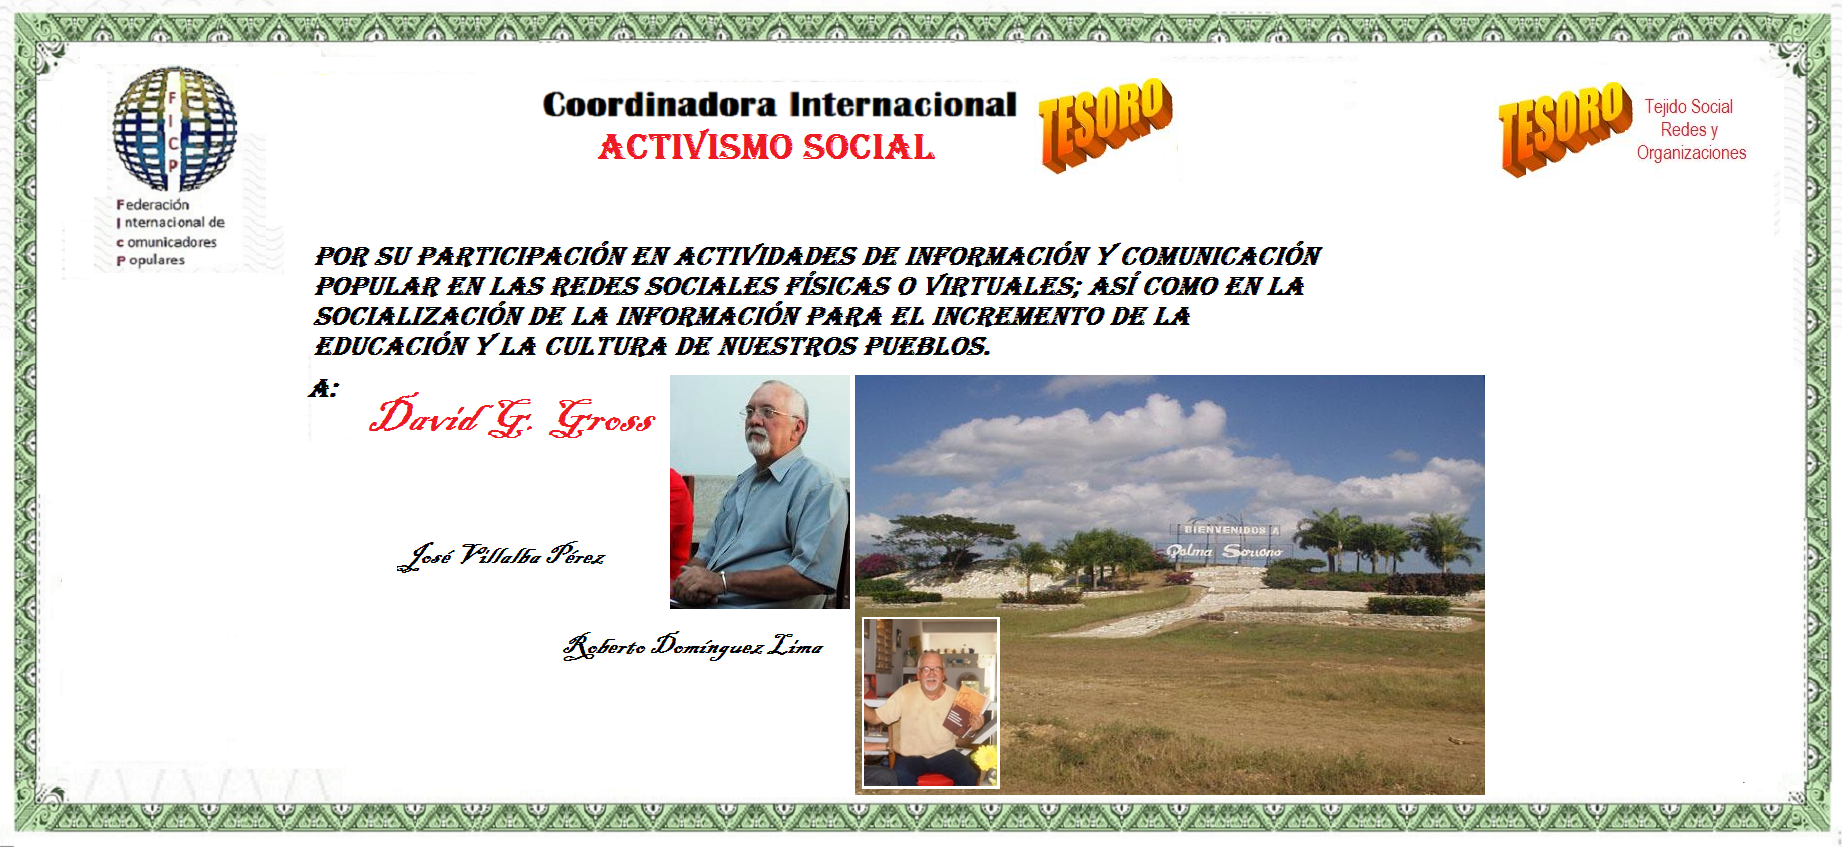 FICP. David G. Gross. ACTIVISMO SOCIAL